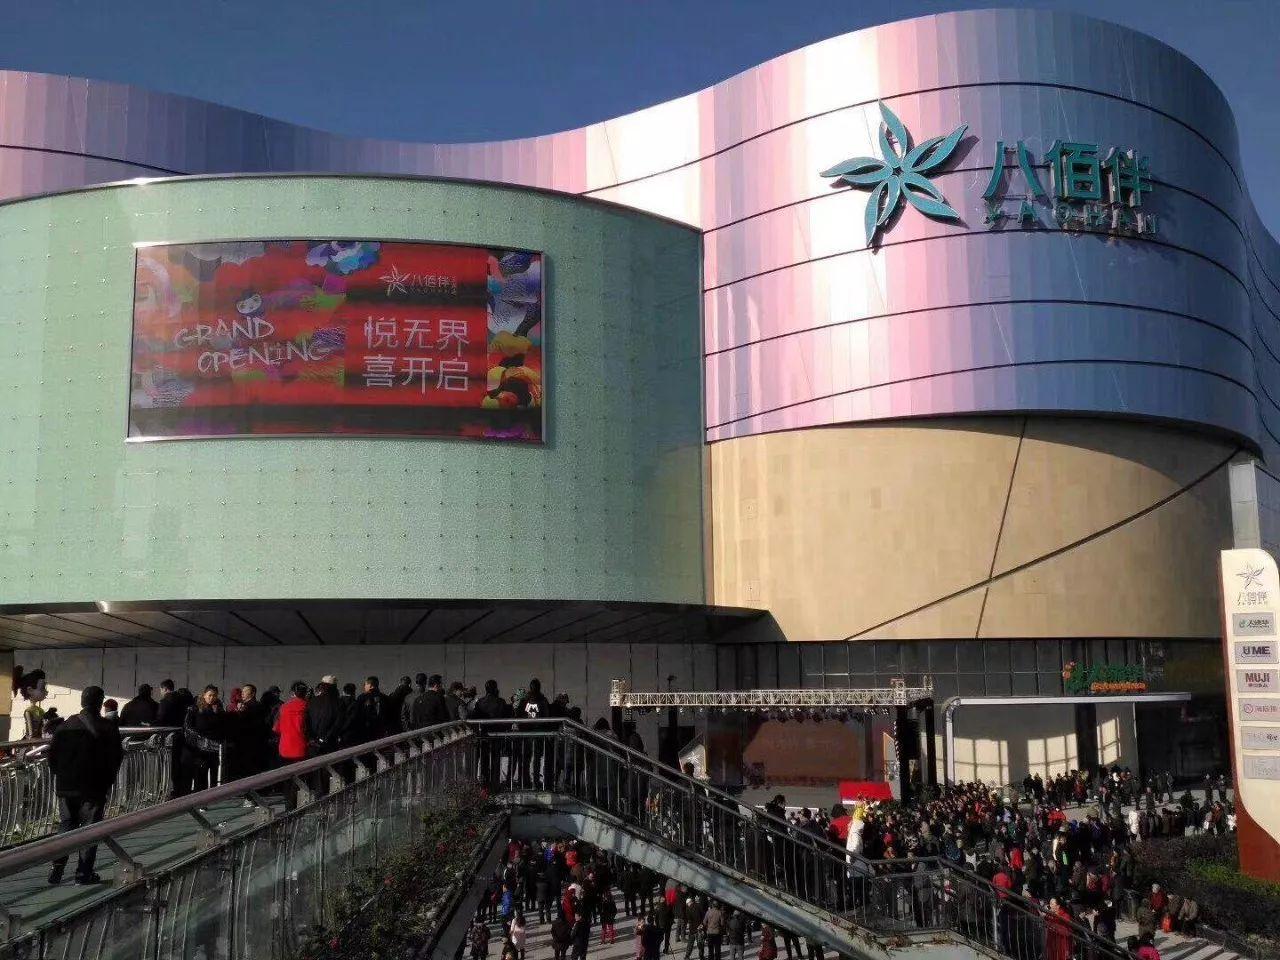 vinbet浩博国际八佰伴正式开业 现场人潮鼎沸